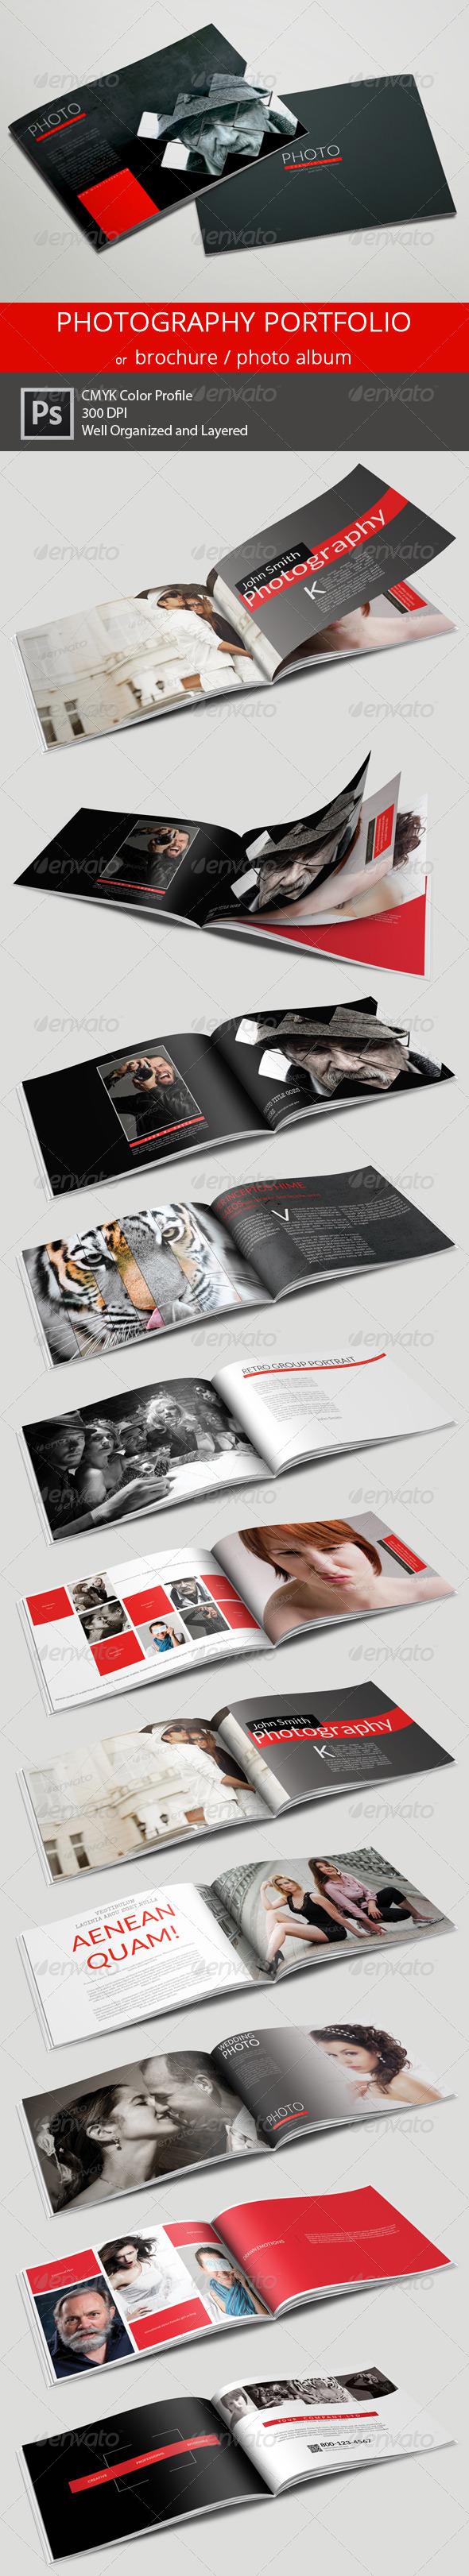 20 Pages Photography Portfolio or Photo Album - Portfolio Brochures